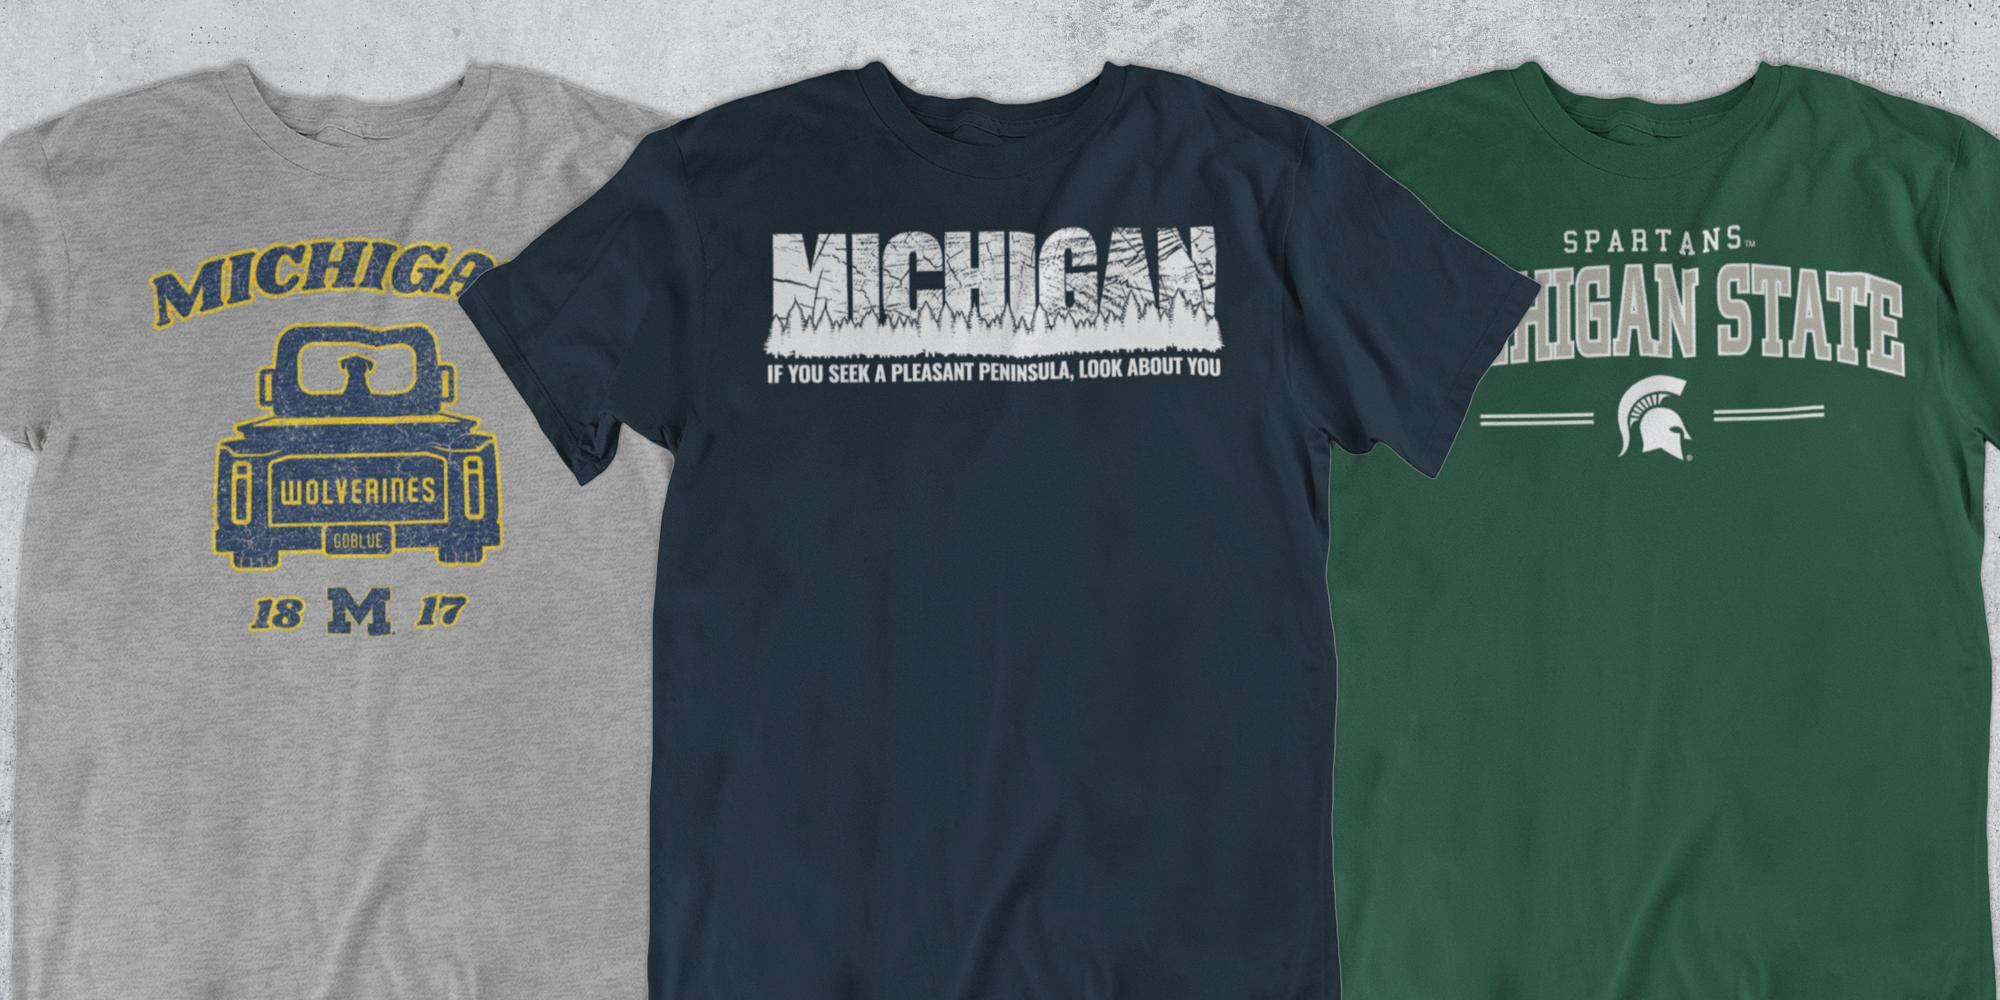 Campus Den Classic sweatshirt.